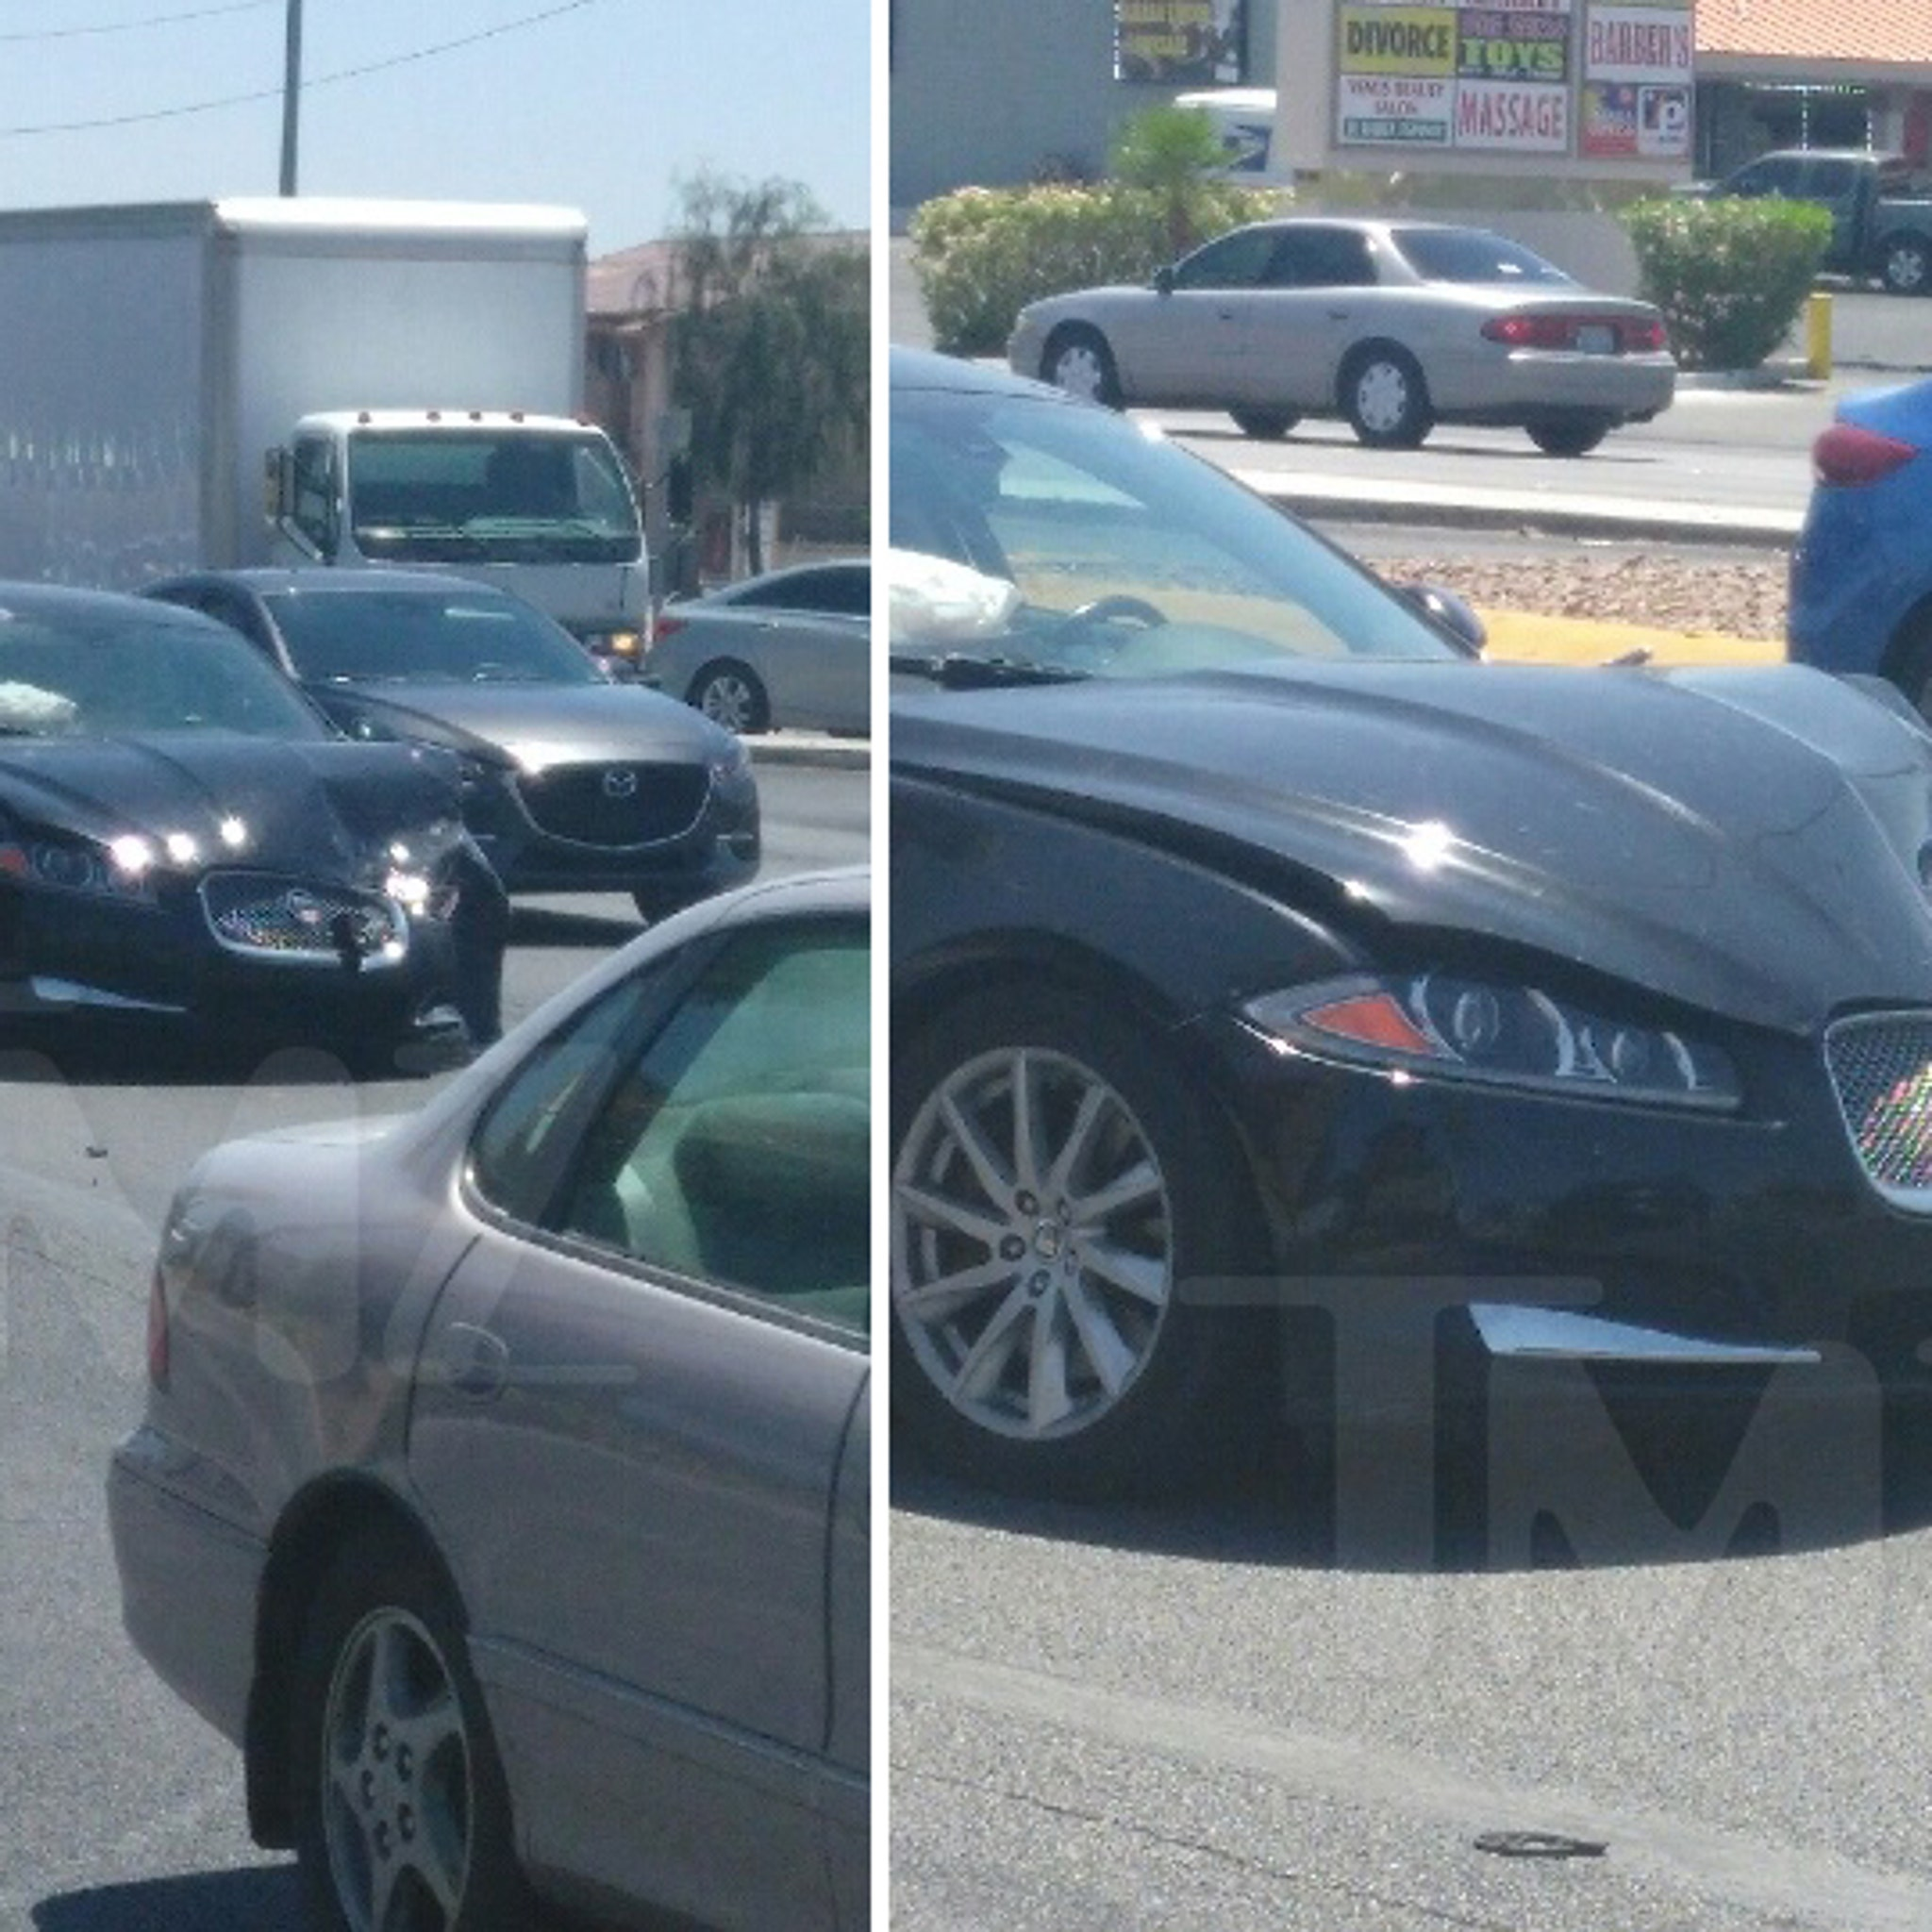 Joe Jackson Rushed to Hospital After Car Crash in Las Vegas (UPDATE)